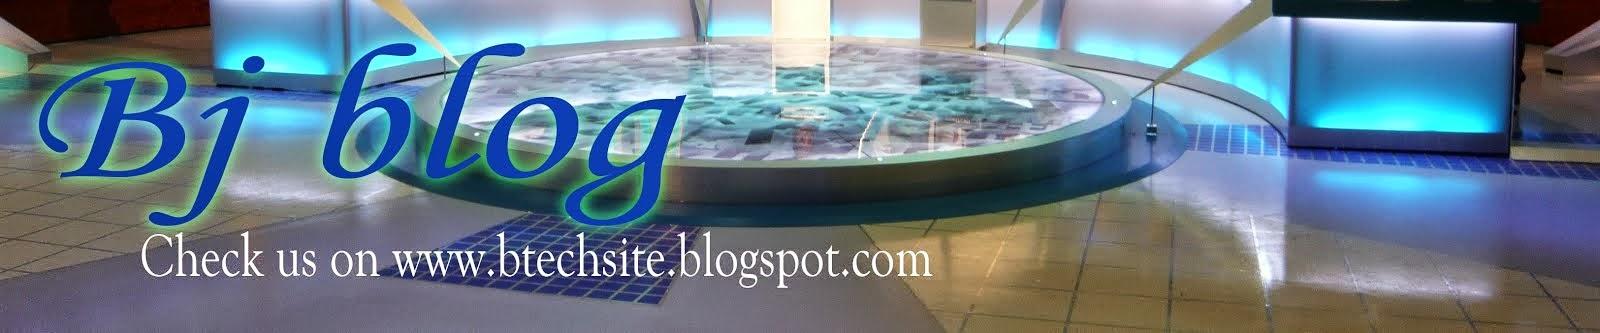 Bj  News blog.